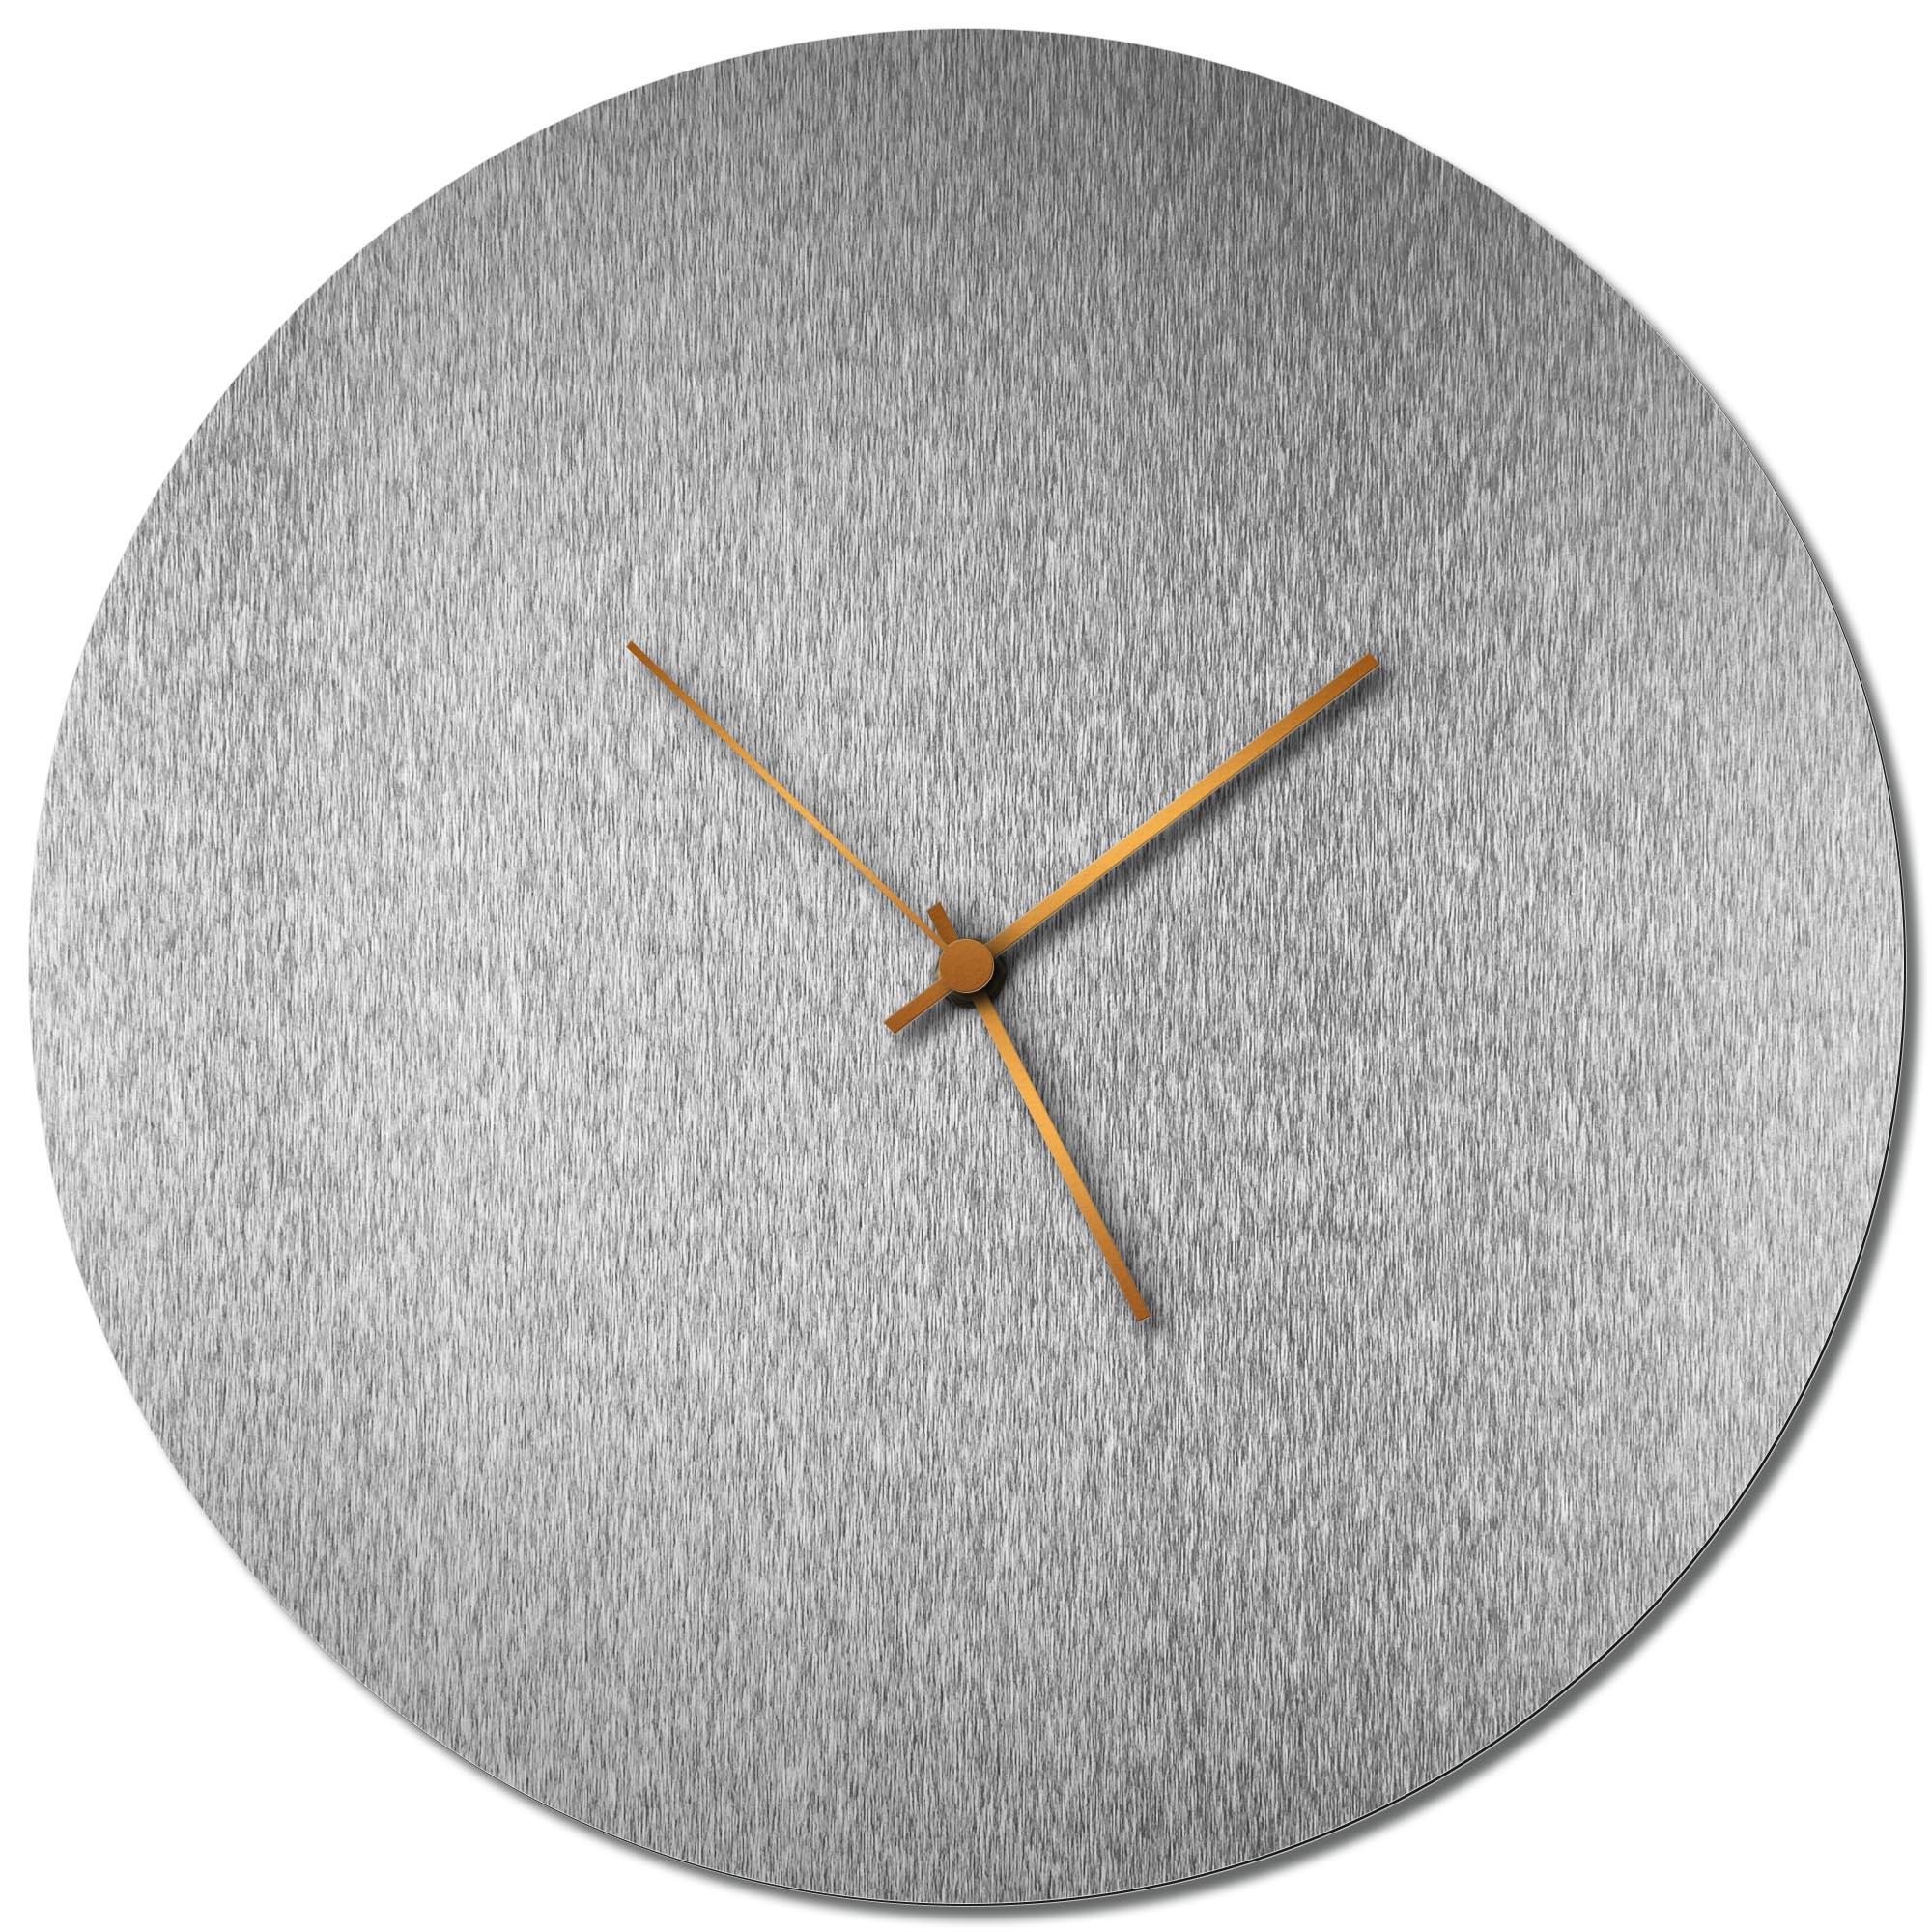 Adam Schwoeppe 'Silversmith Circle Clock Large Bronze' Midcentury Modern Style Wall Clock